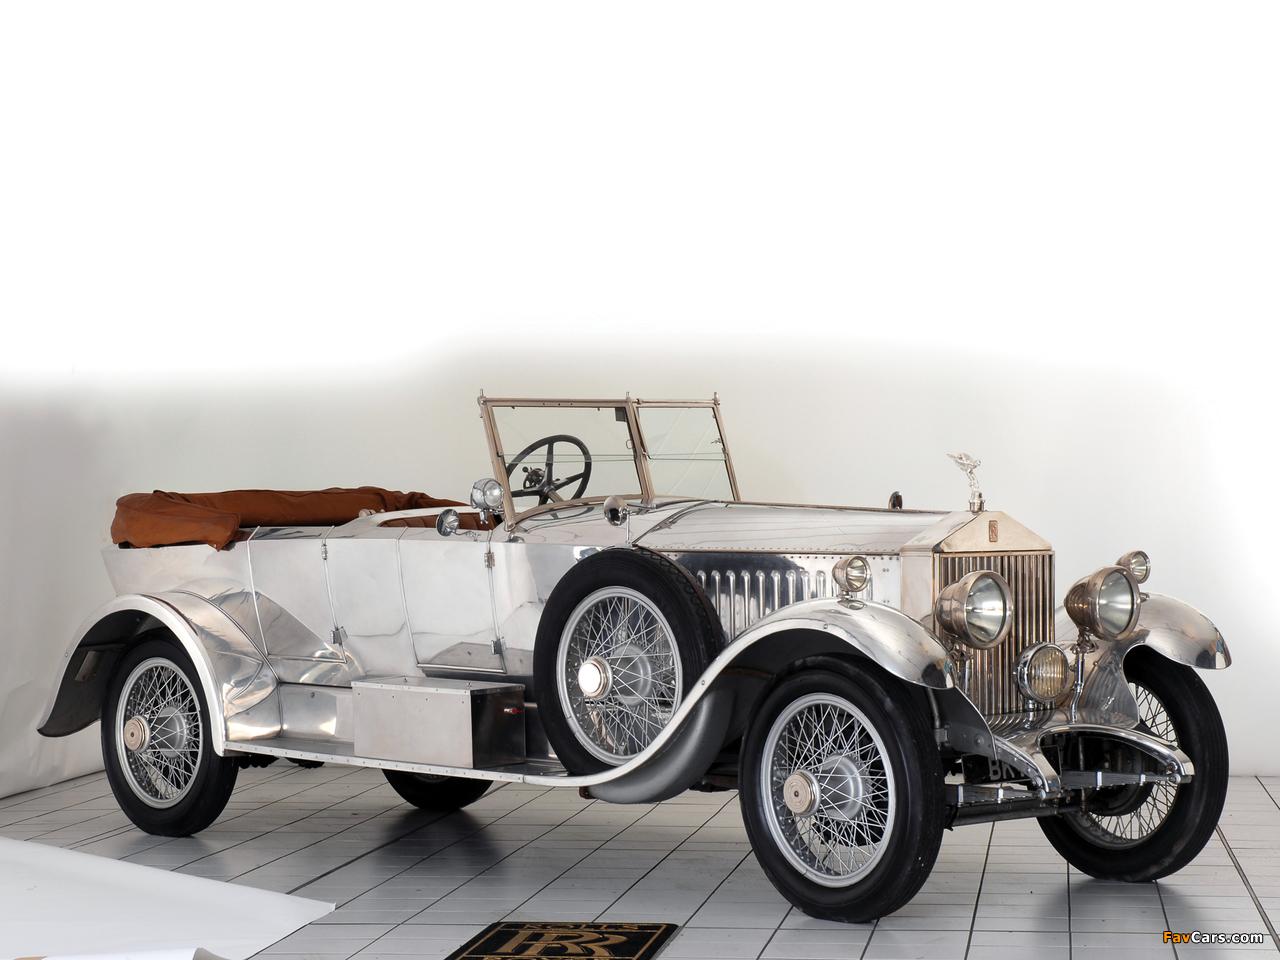 Rolls-Royce Phantom I 40/50 HP Open Tourer by Windover 1926 photos (1280 x 960)